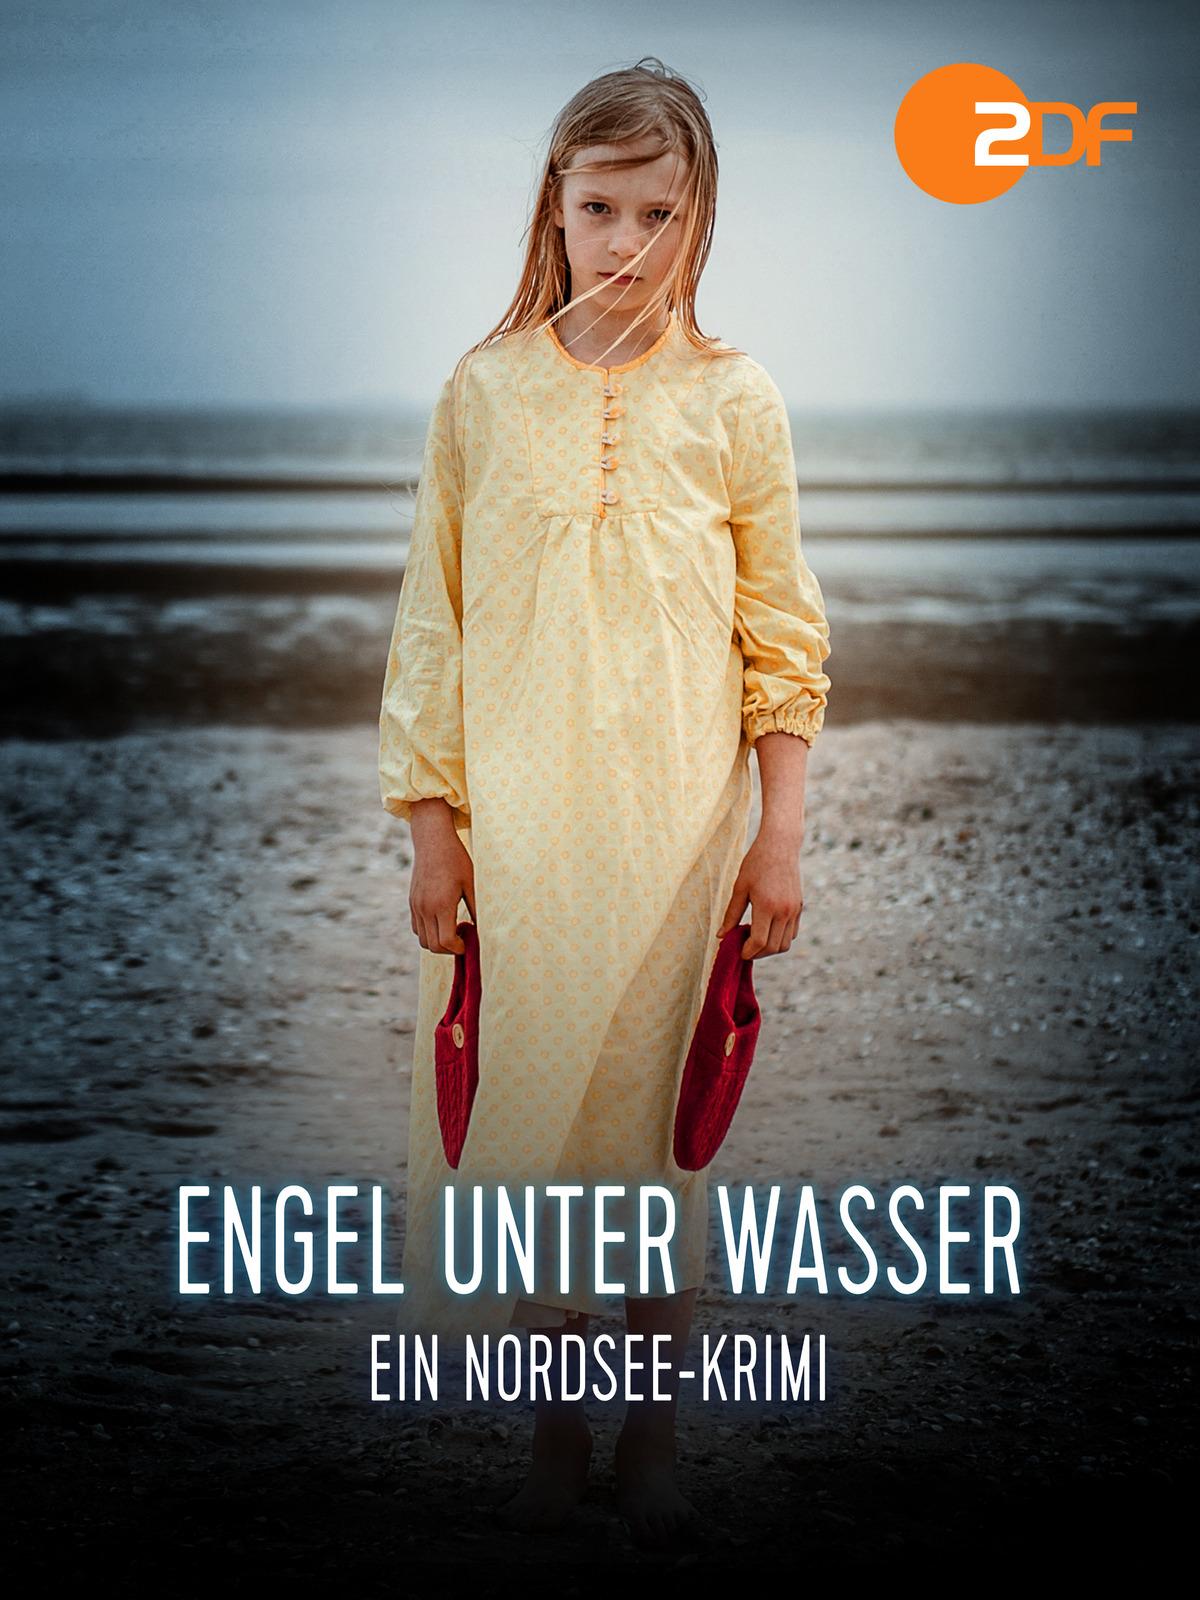 Engel Unter Wasser D 2014 Anna Maria Muhe Hanno Koffler Walter Kreye Streams Tv Termine News Dvds Tv Wunschliste